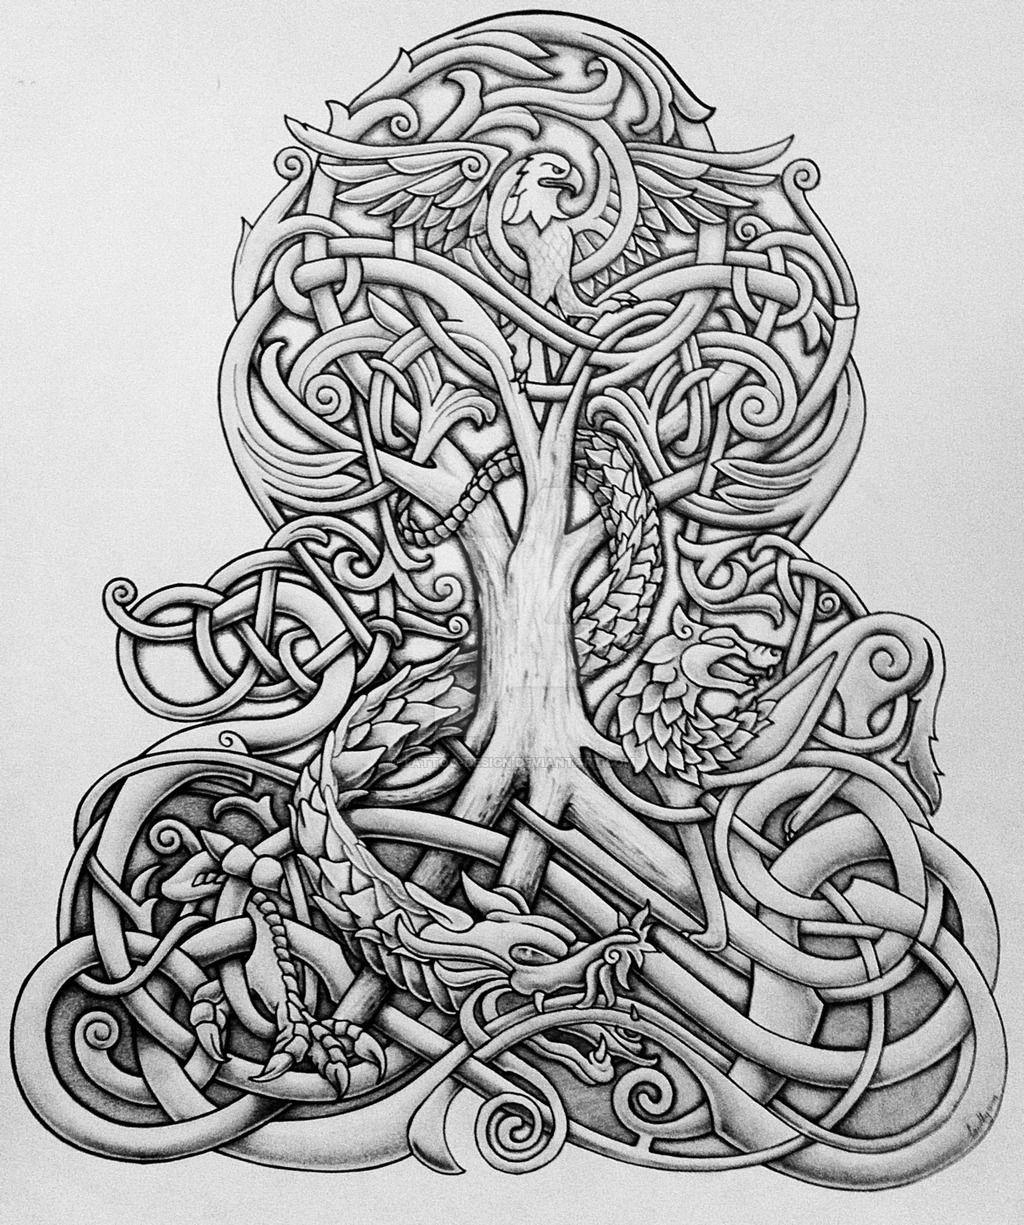 Yggdrasil And Dragon By Tattoo Design Deviantart Com On Deviantart